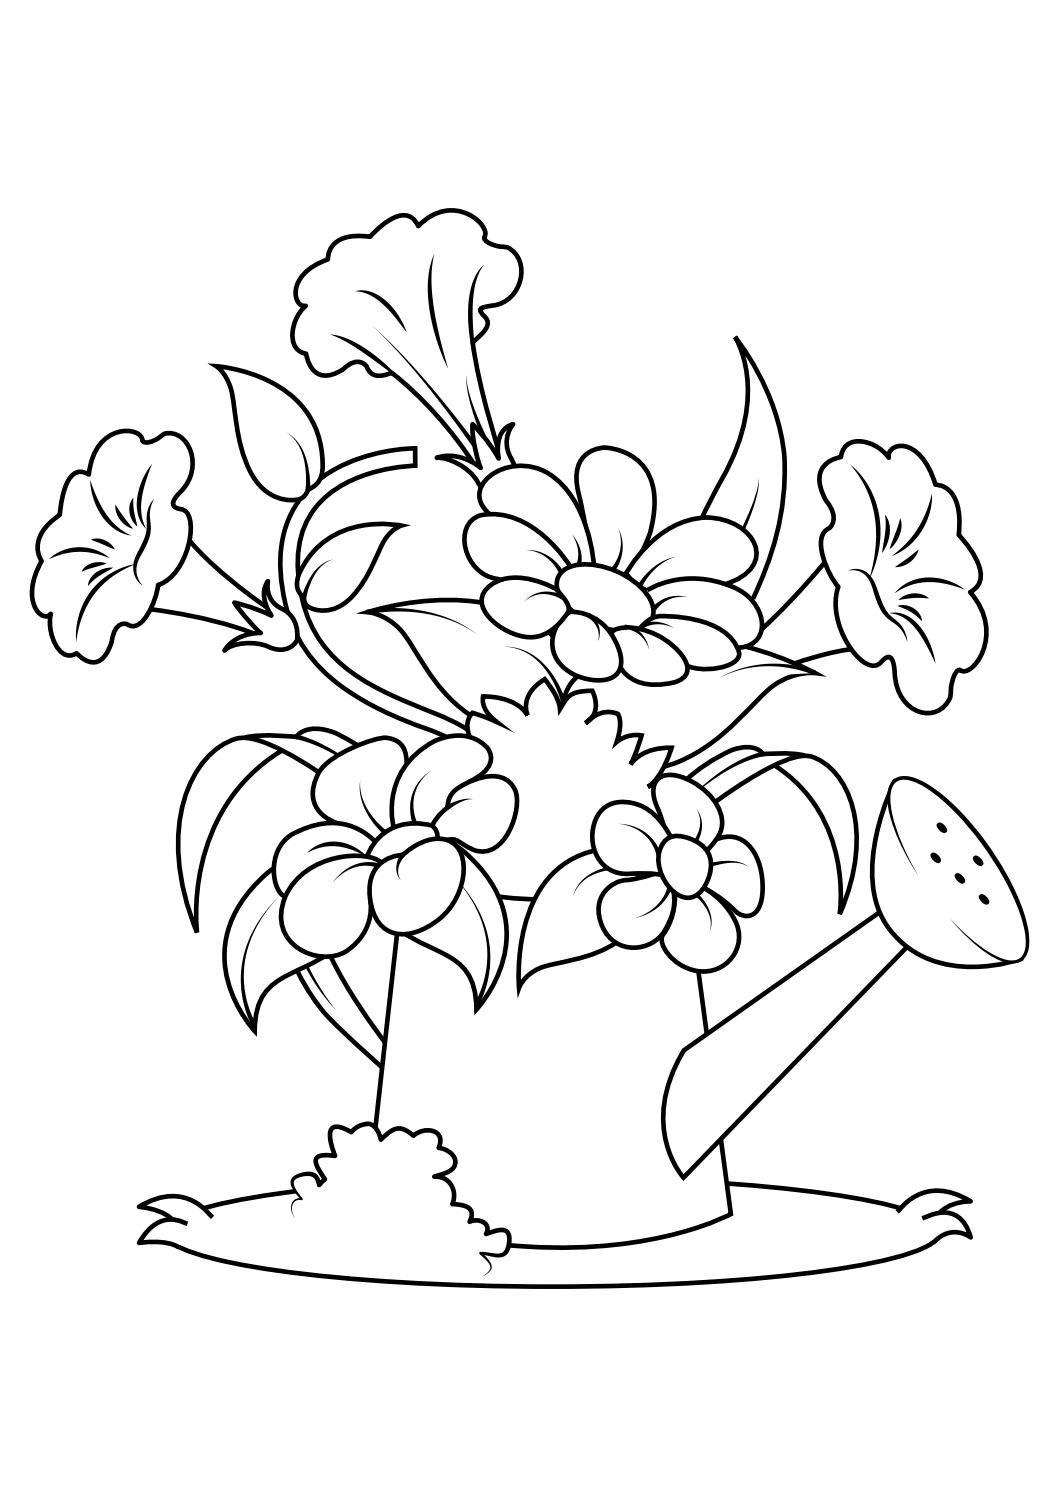 Pin De Alalfia Worksheets Amp English T Em Flower Coloring Pages